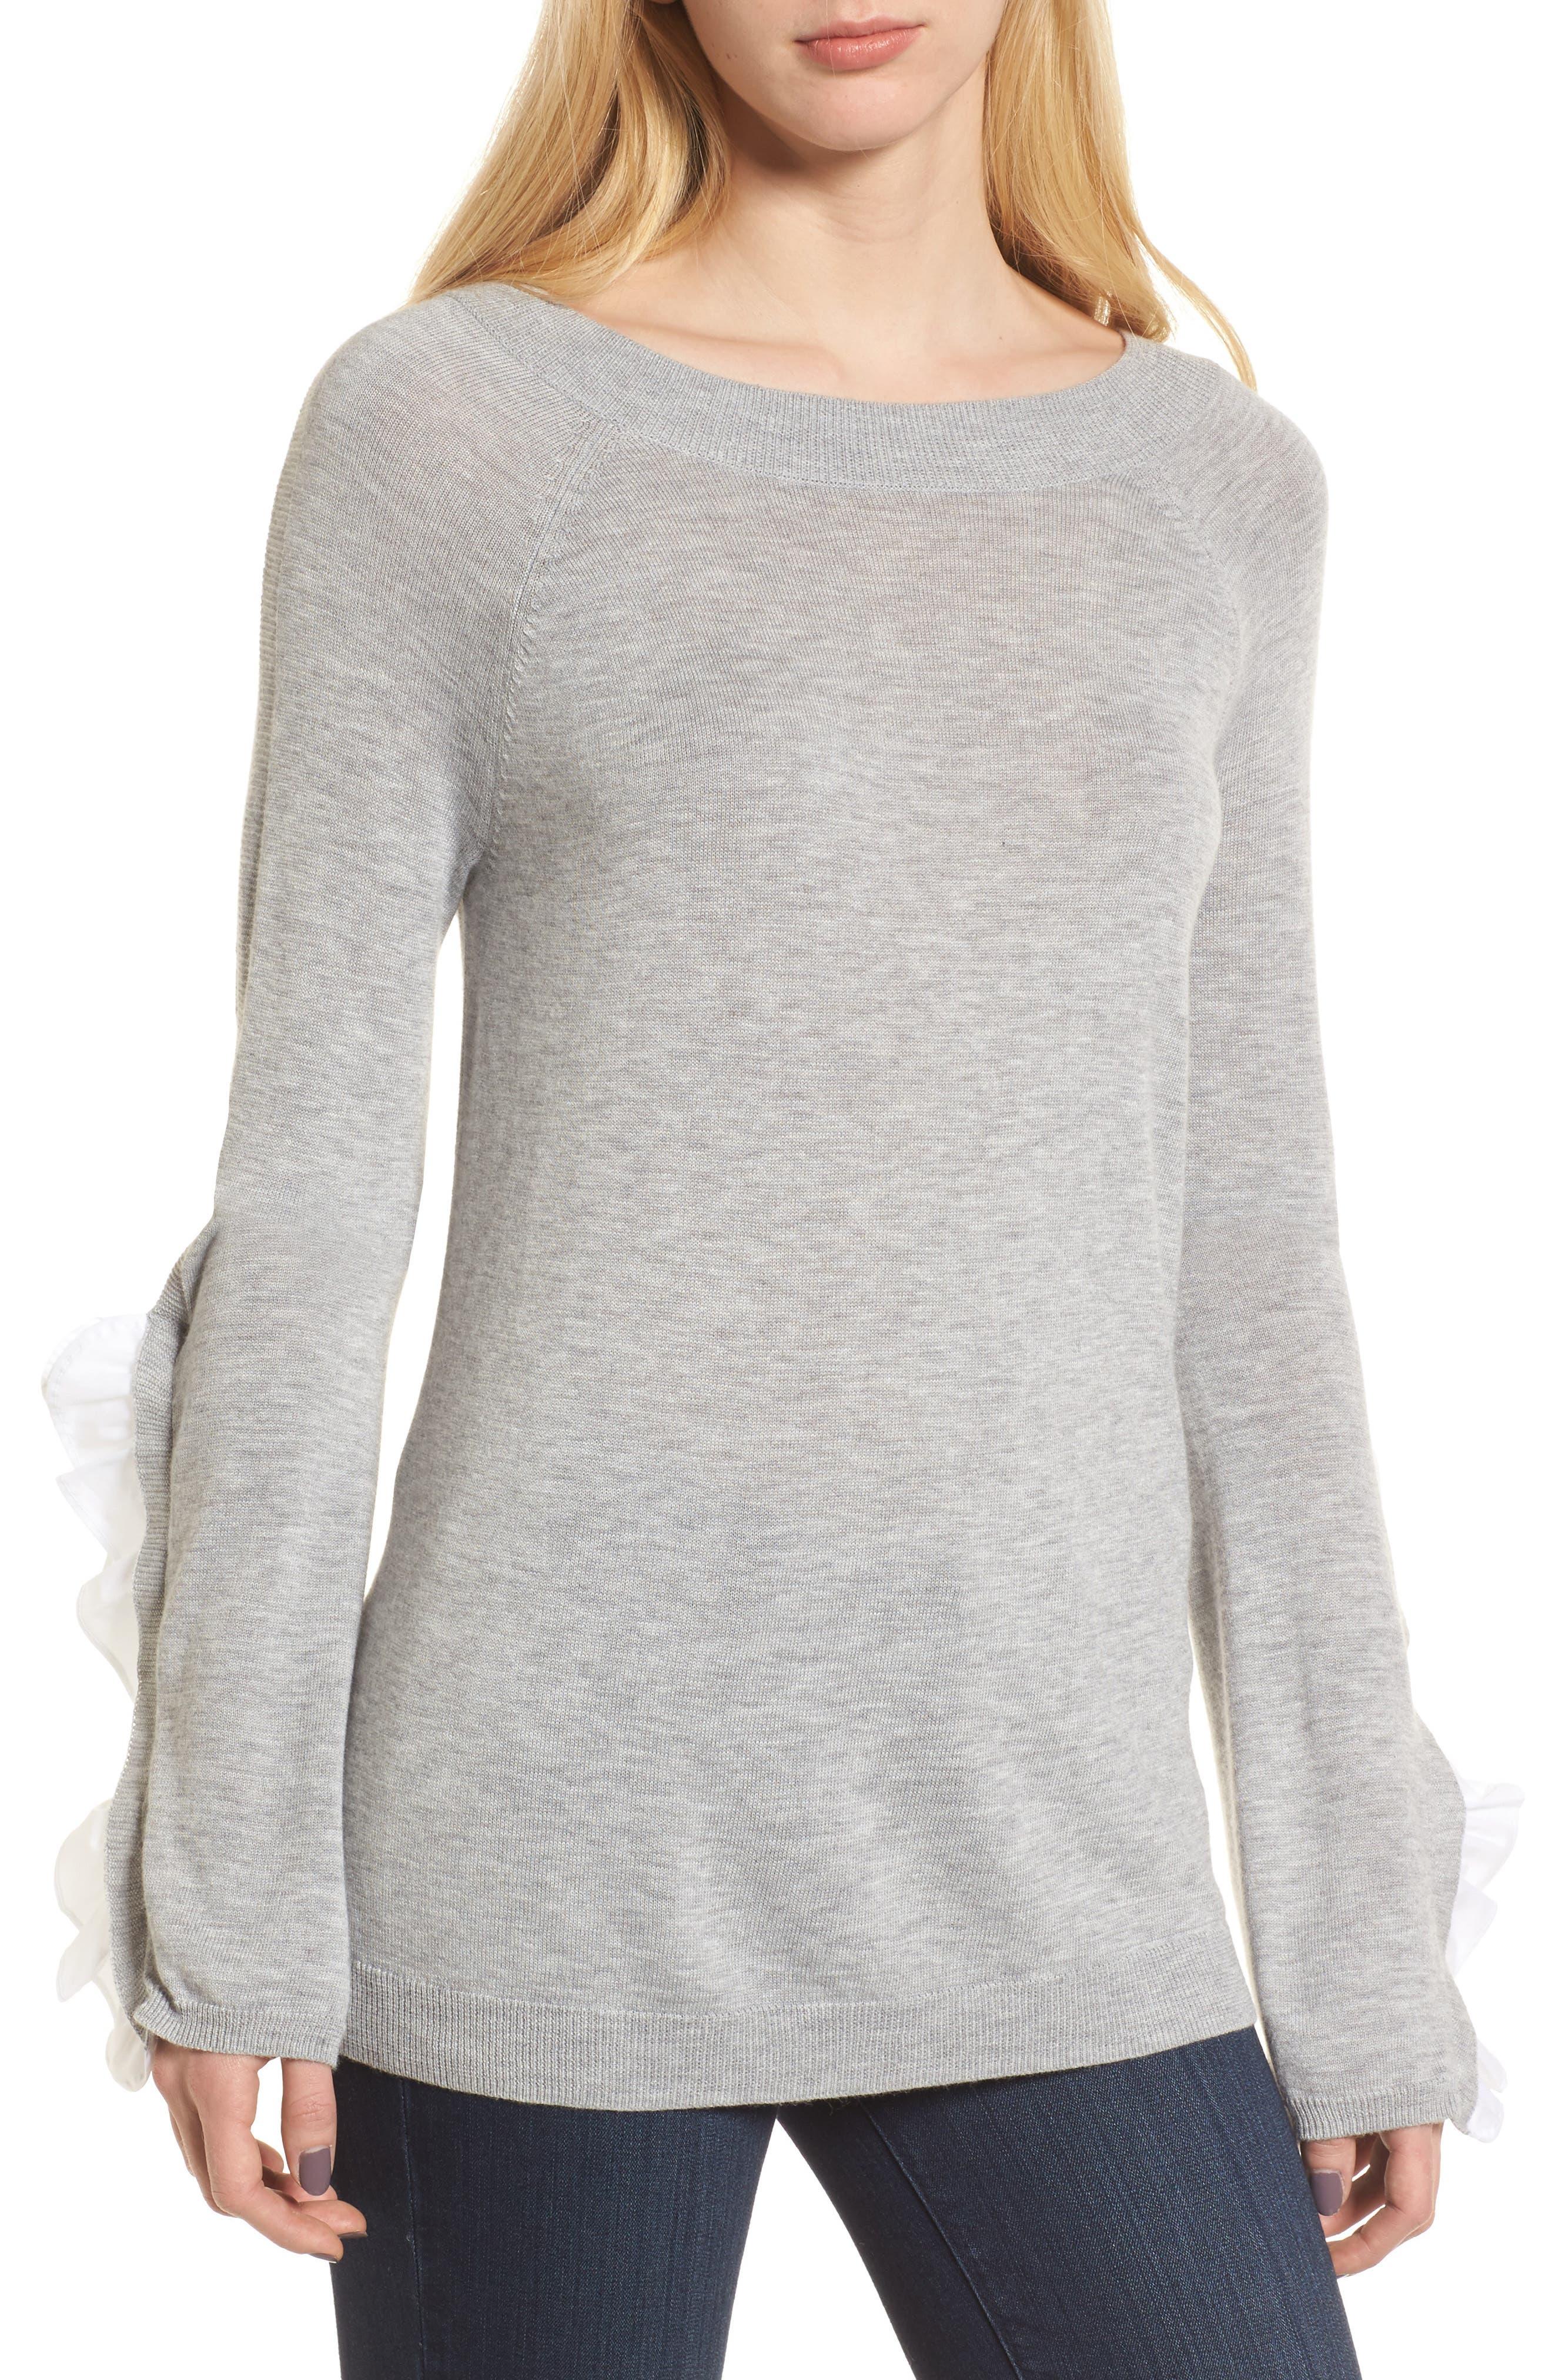 Ruffle Sleeve Sweater,                             Main thumbnail 1, color,                             Grey Heather